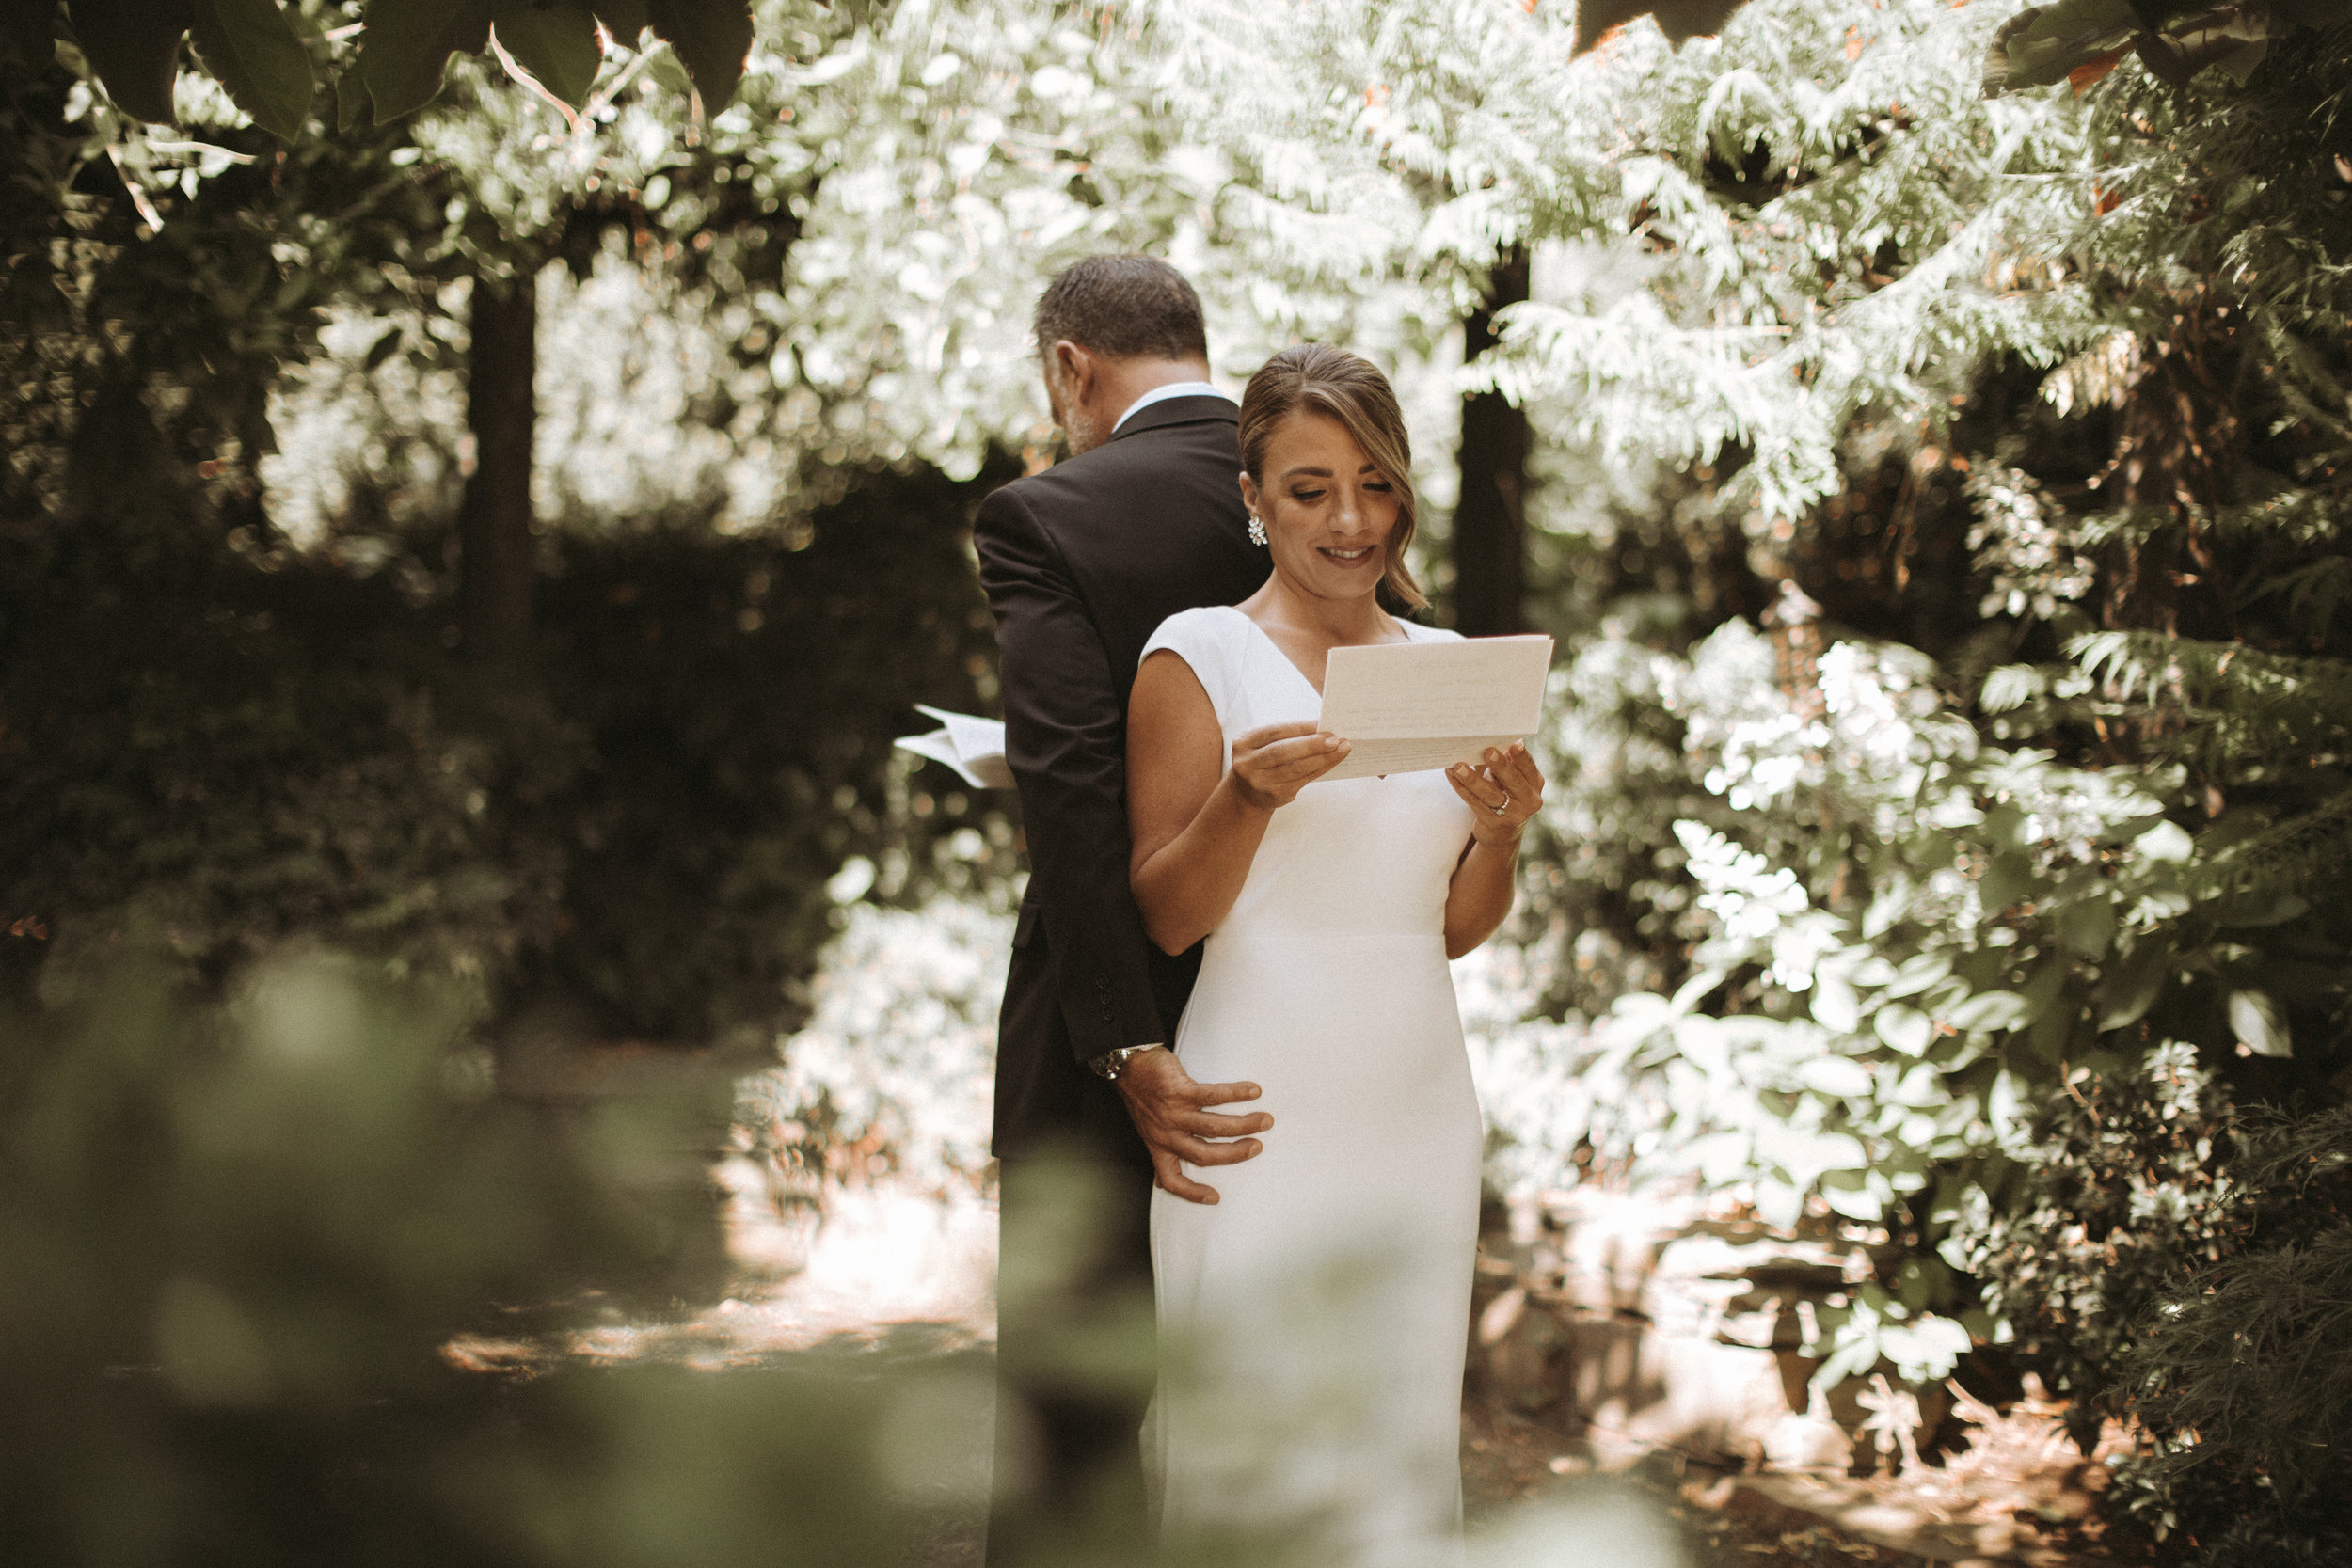 PORTLAND INTIMATE BACKYARD WEDDING_JENNY CHOKBENGBOUN PHOTO-125.JPG